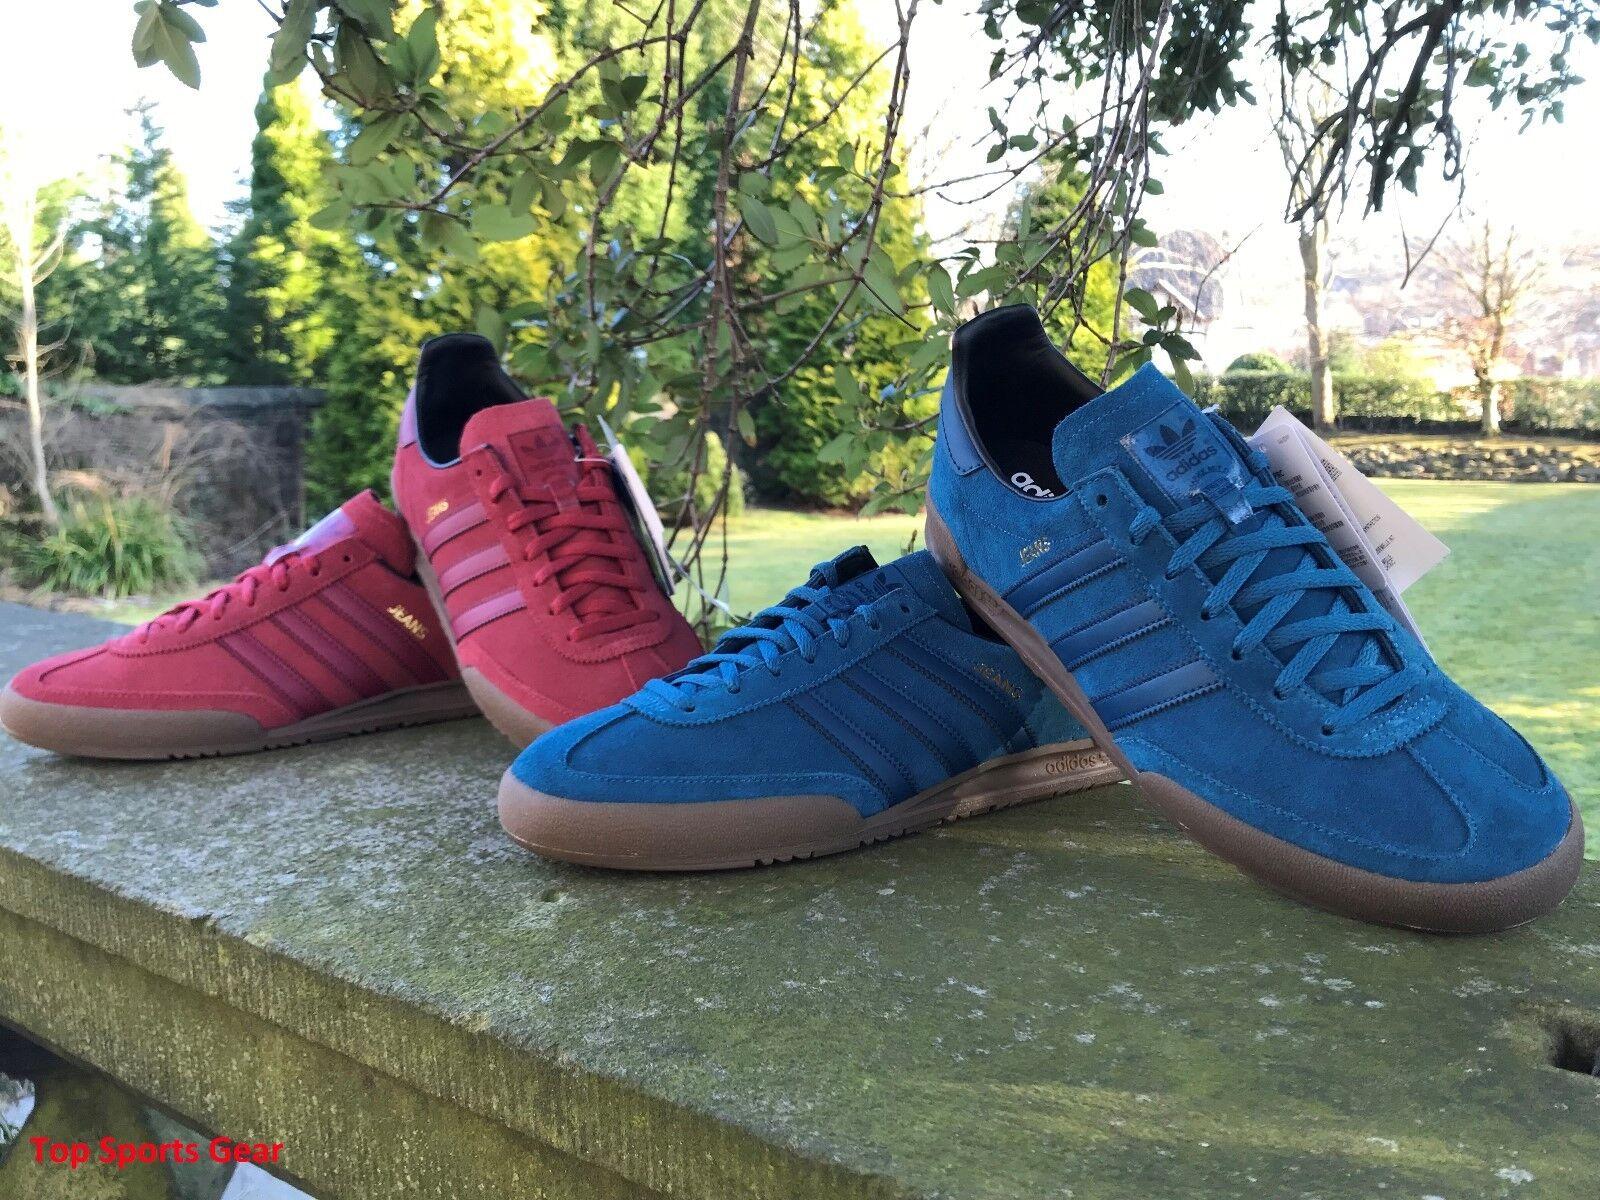 Adidas Originals Boys  Uomo Jeans Fashion Trainers UK ROT Blau BNIBWT Größes UK Trainers 3 -13 257ccf